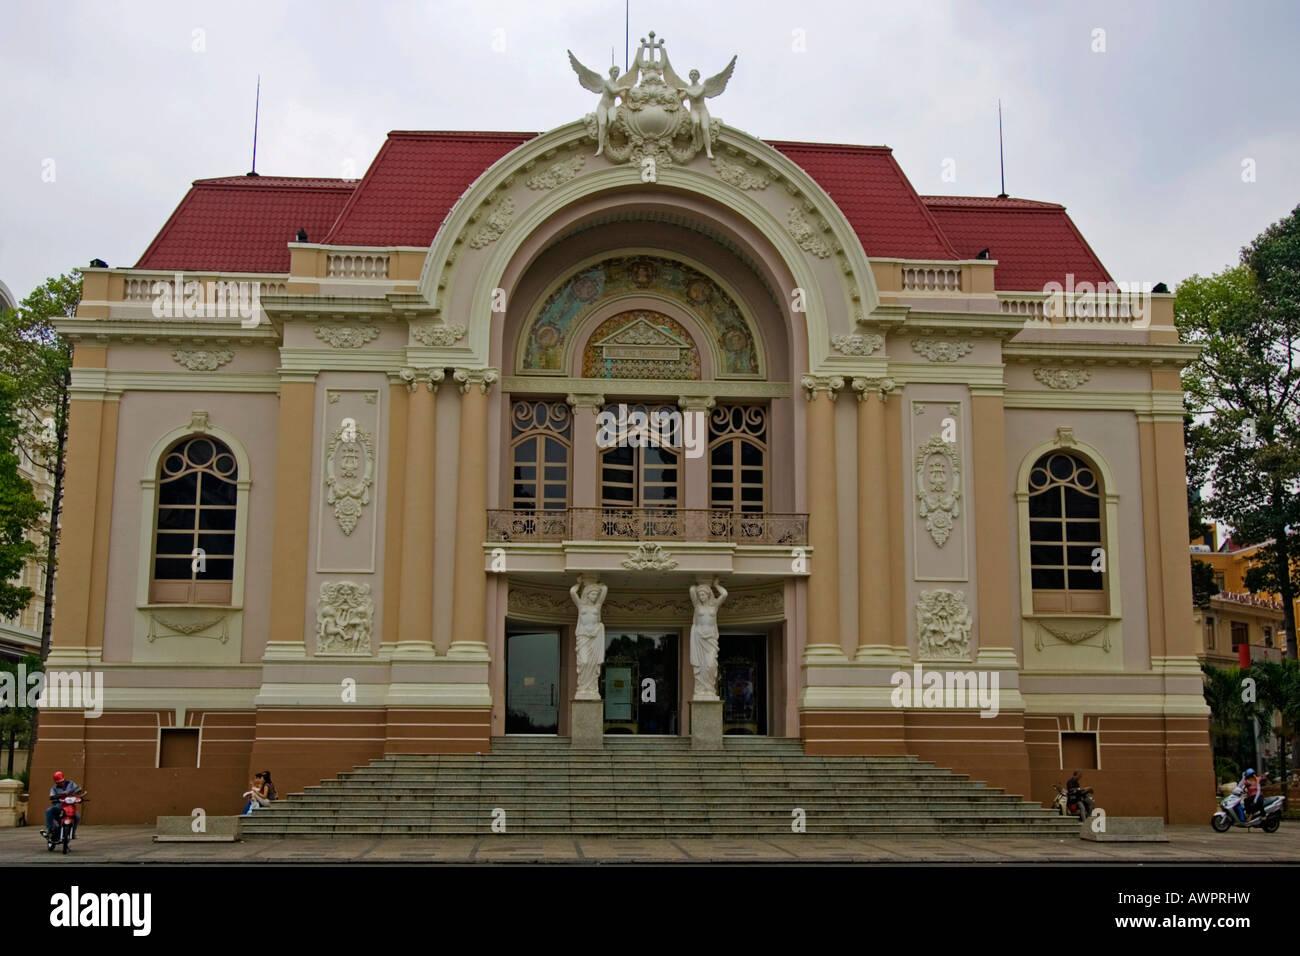 Opera house, Ho Chi Minh City, Saigon, Viet Nam - Stock Image